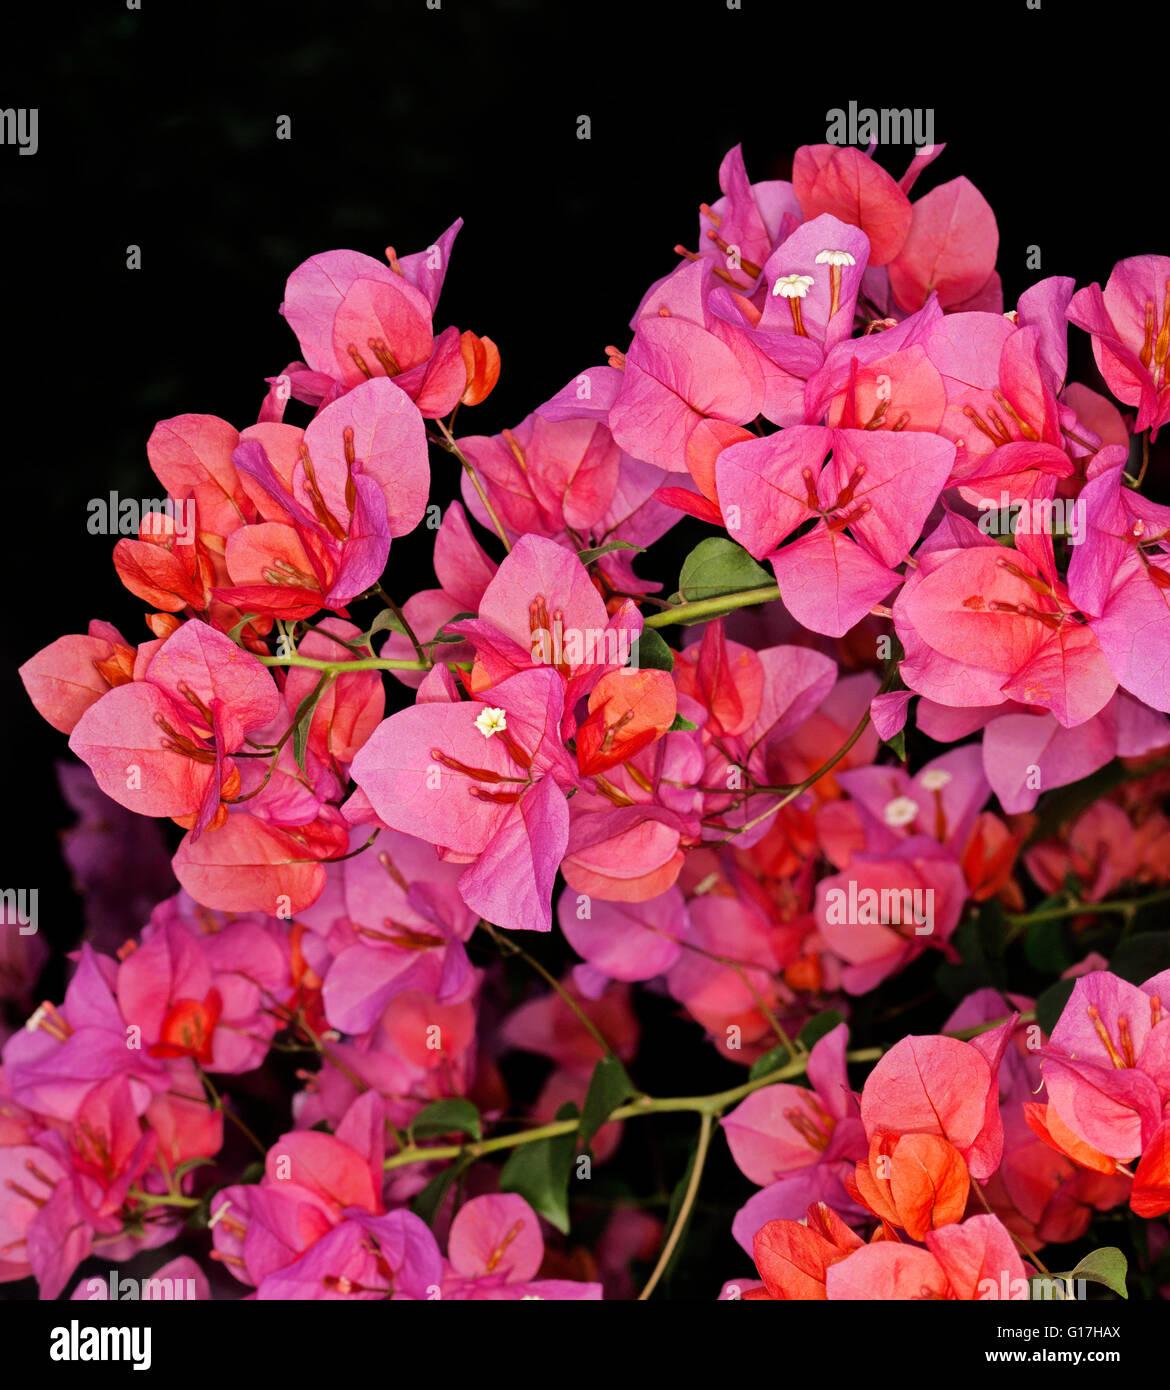 Cluster Of Spectacular Vivid Pink Orange Flowers Of Bougainvillea